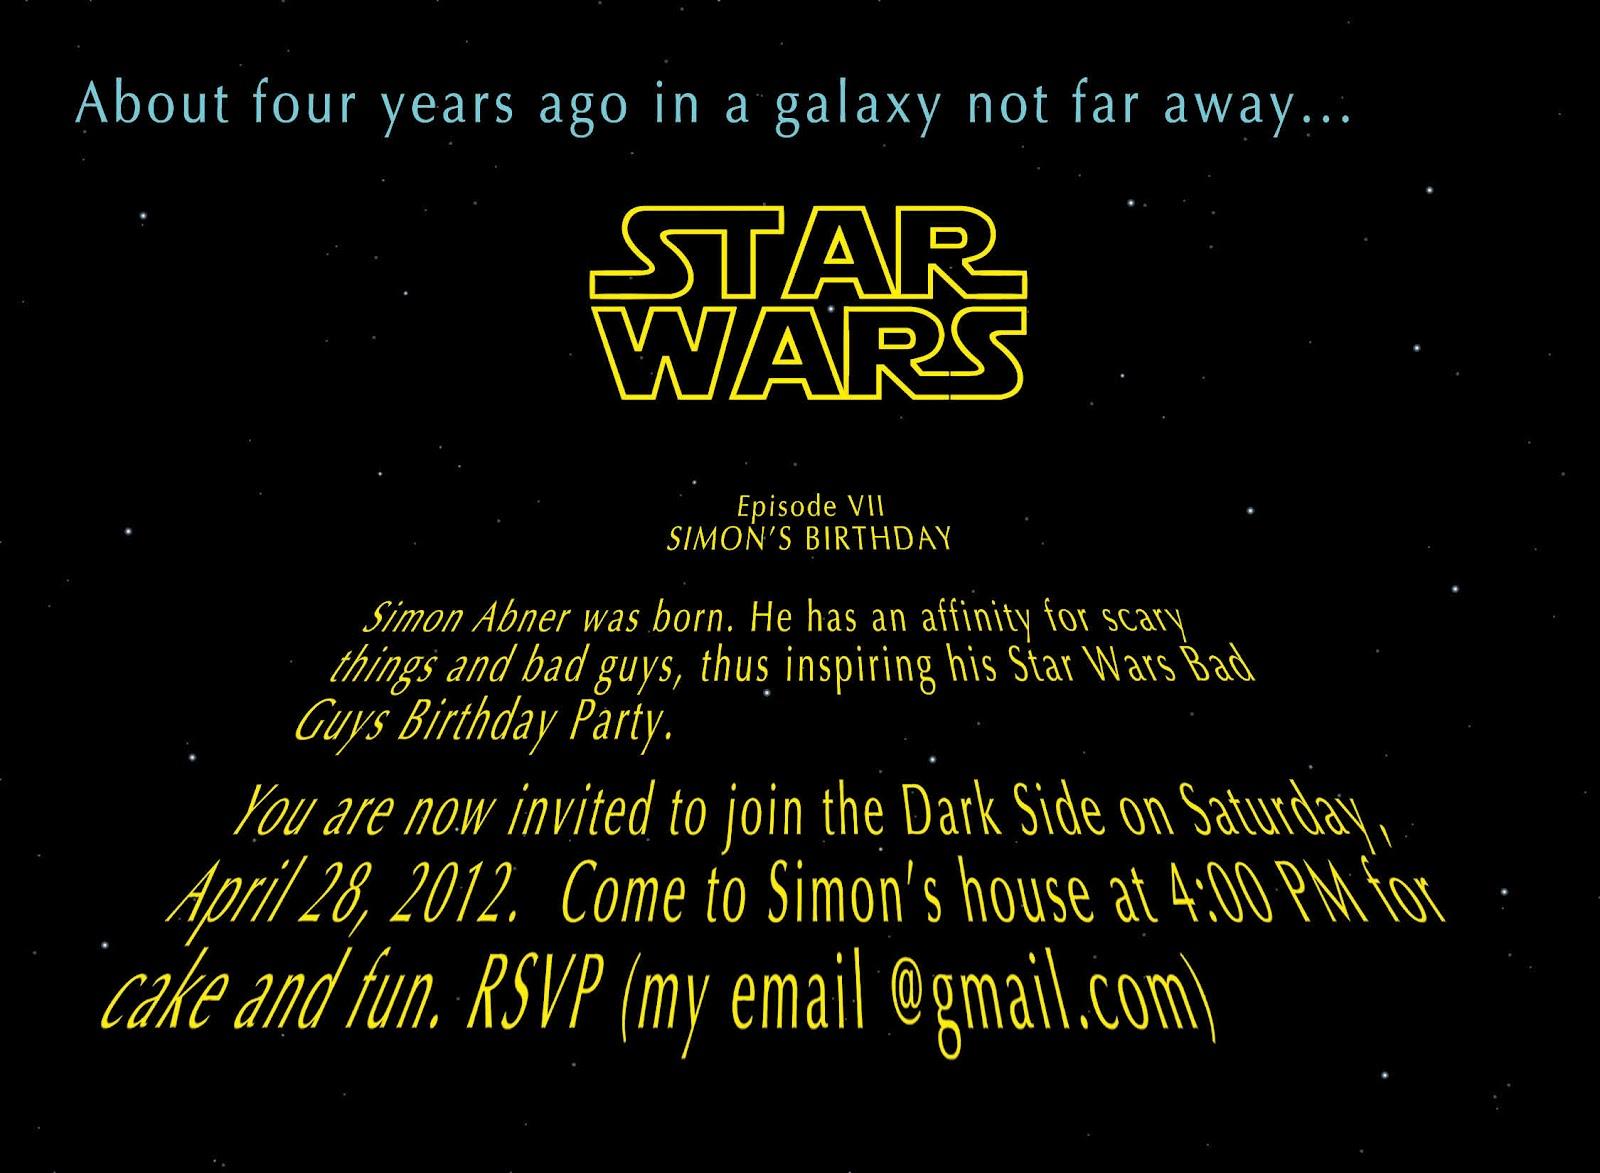 Weesher Weesh Star Wars Bad Guys Birthday